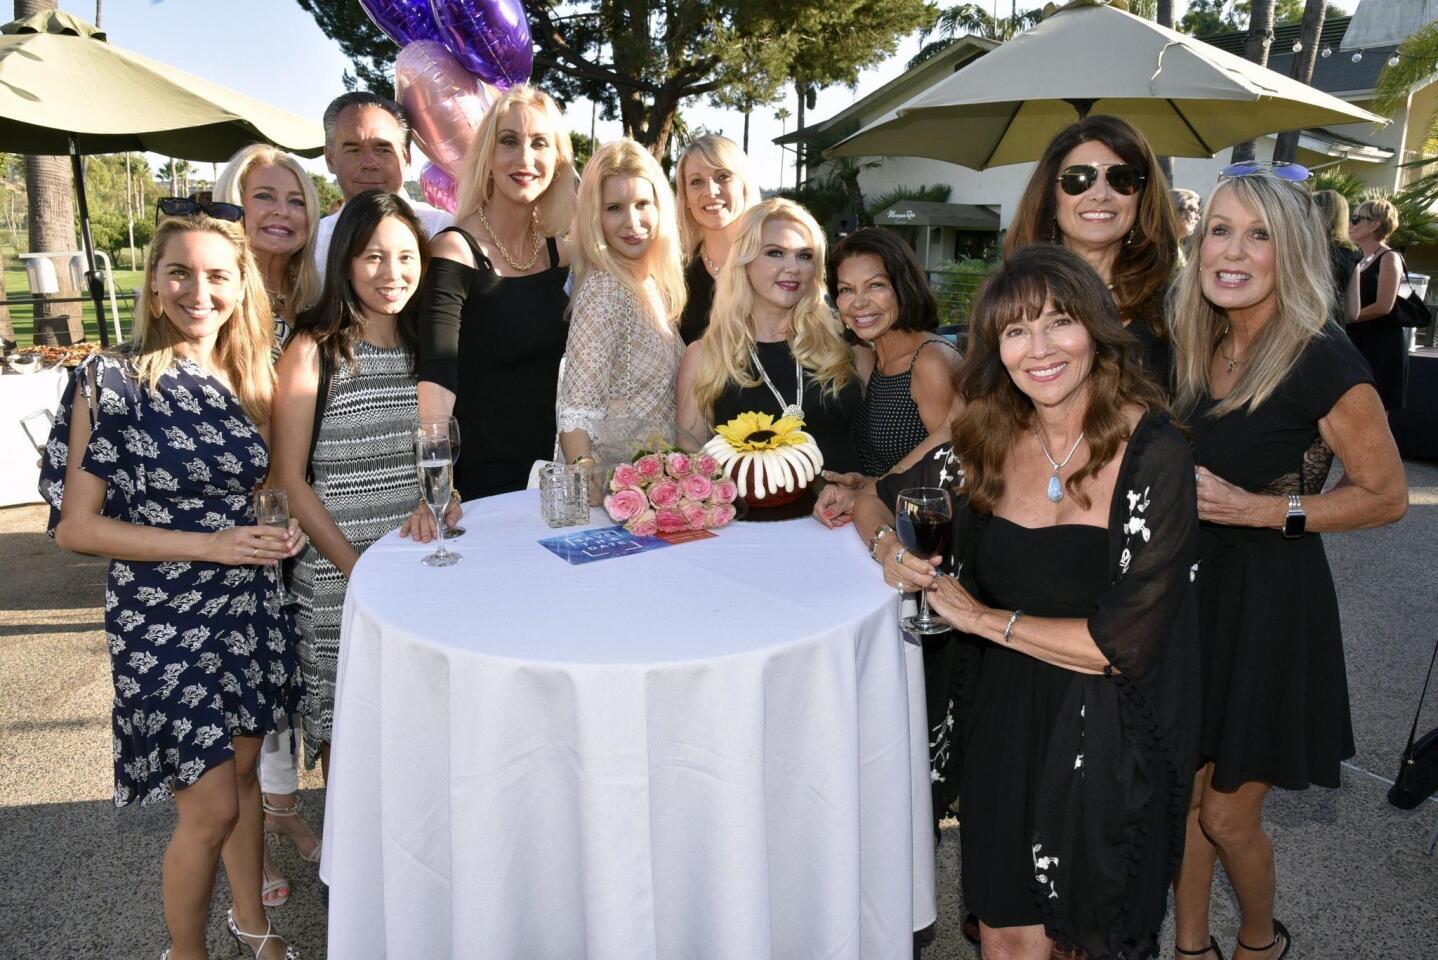 The RSF Rotary celebrated with Tatiana Novick on her birthday